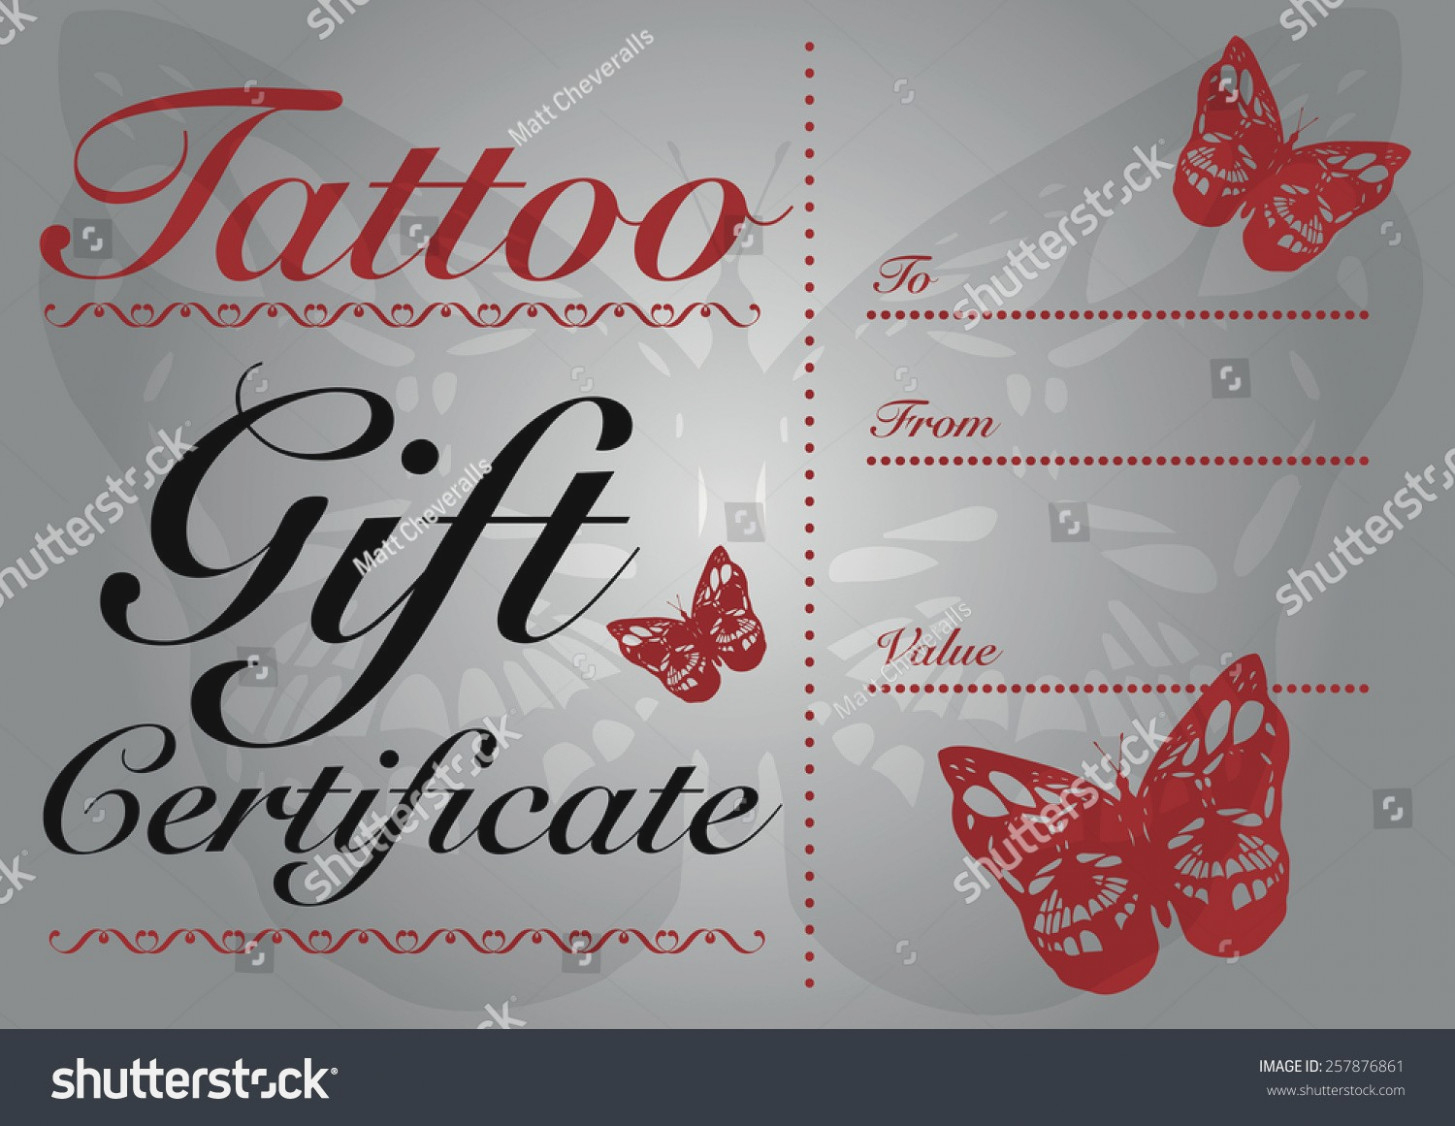 Tattoo Gift Certificate Template 13 Free Printable Templates - Free Printable Tattoo Gift Certificates